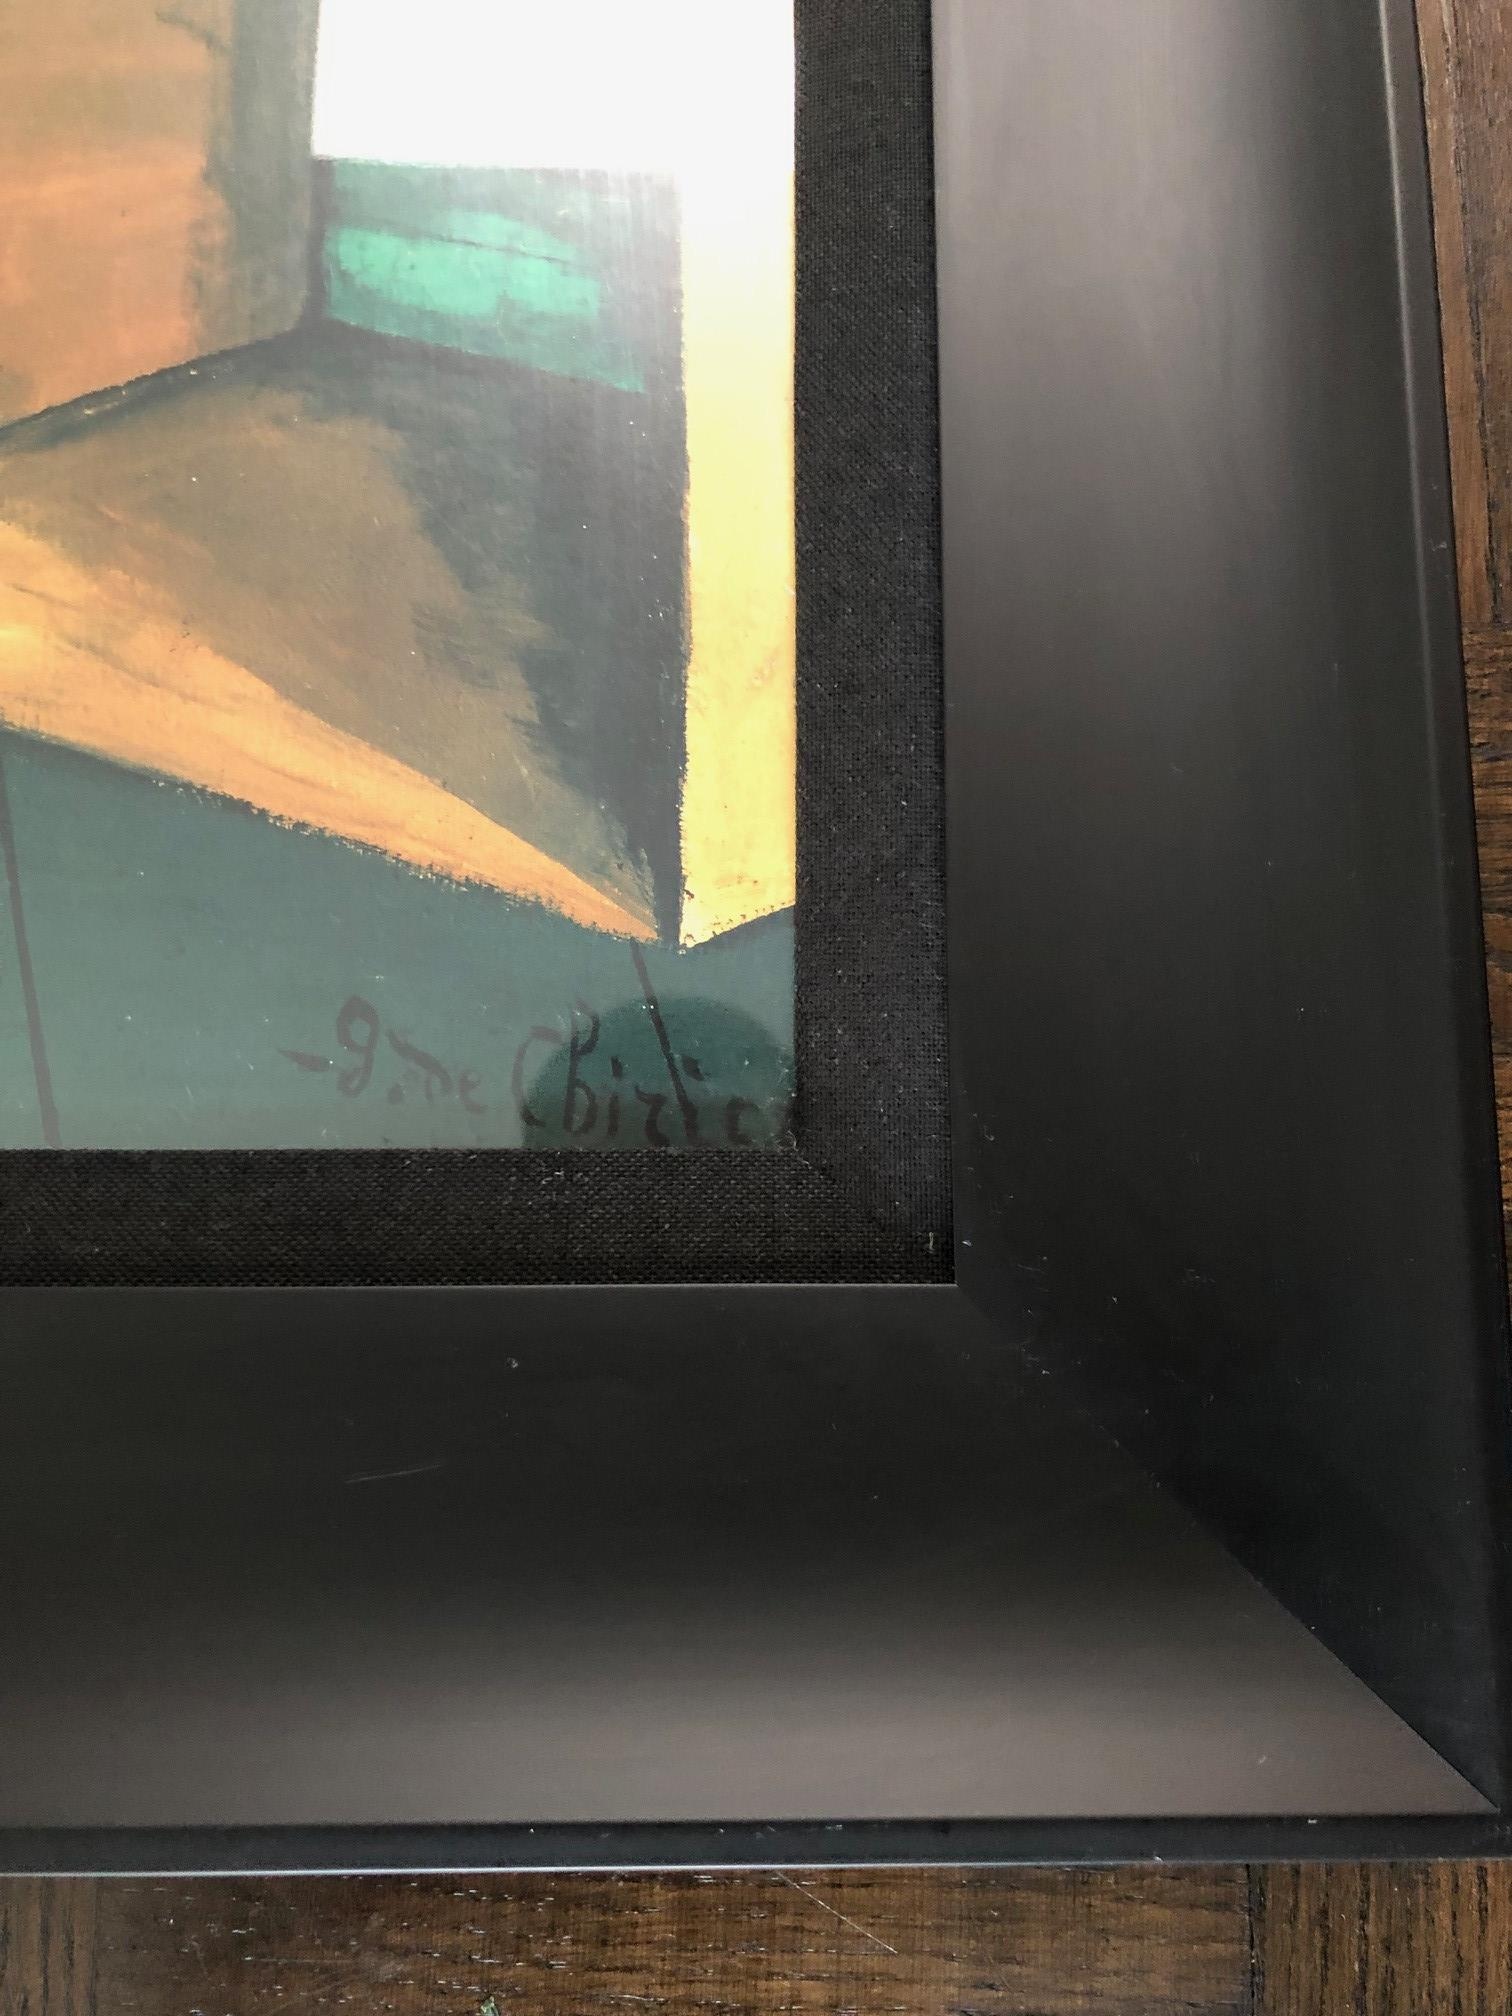 DeChirico Framed Print Reproduction w/ Black Wood Frame